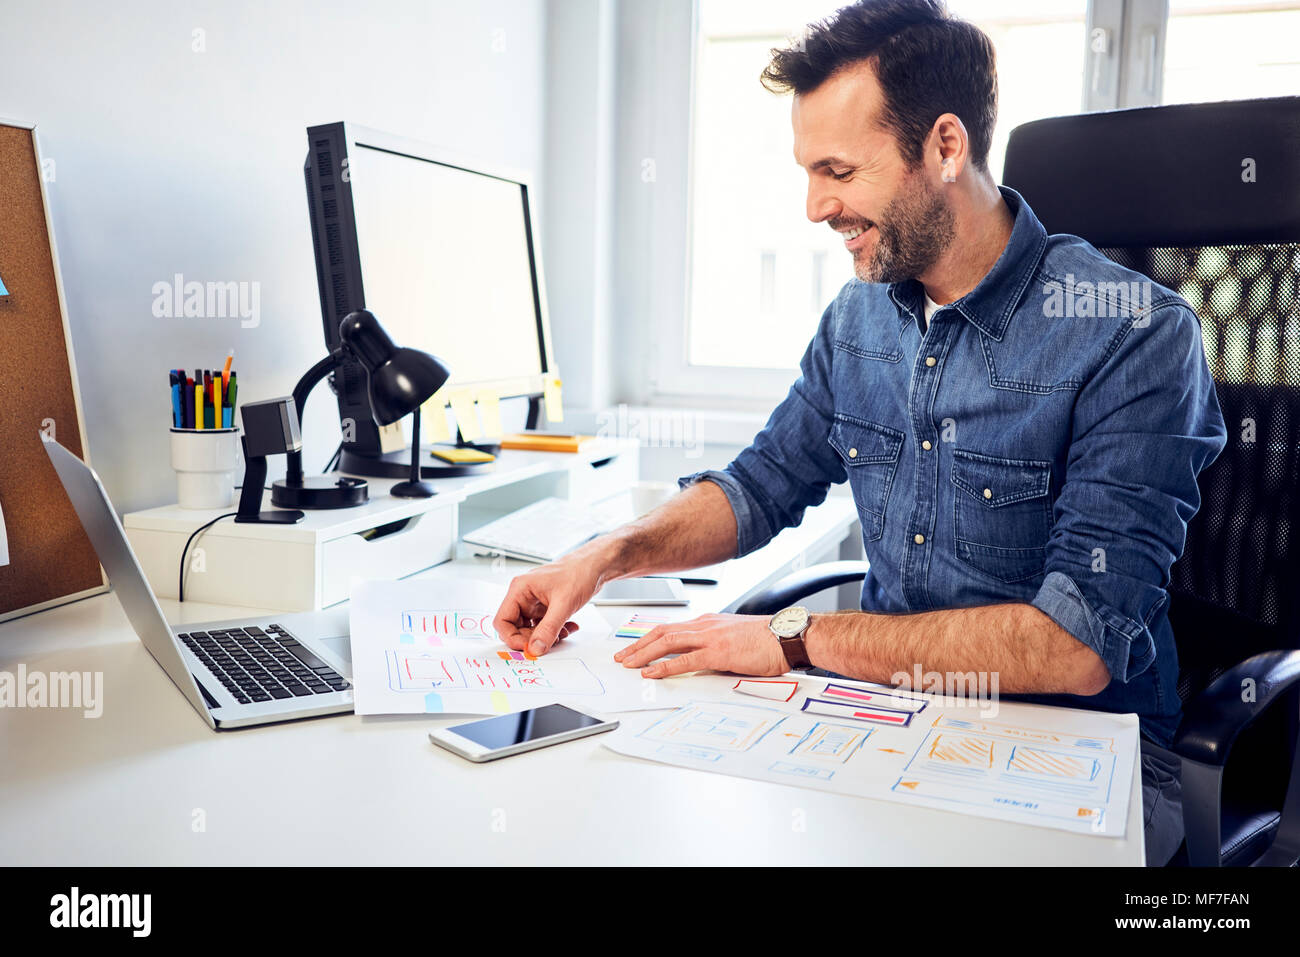 Smiling web designer working on draft at desk in office - Stock Image